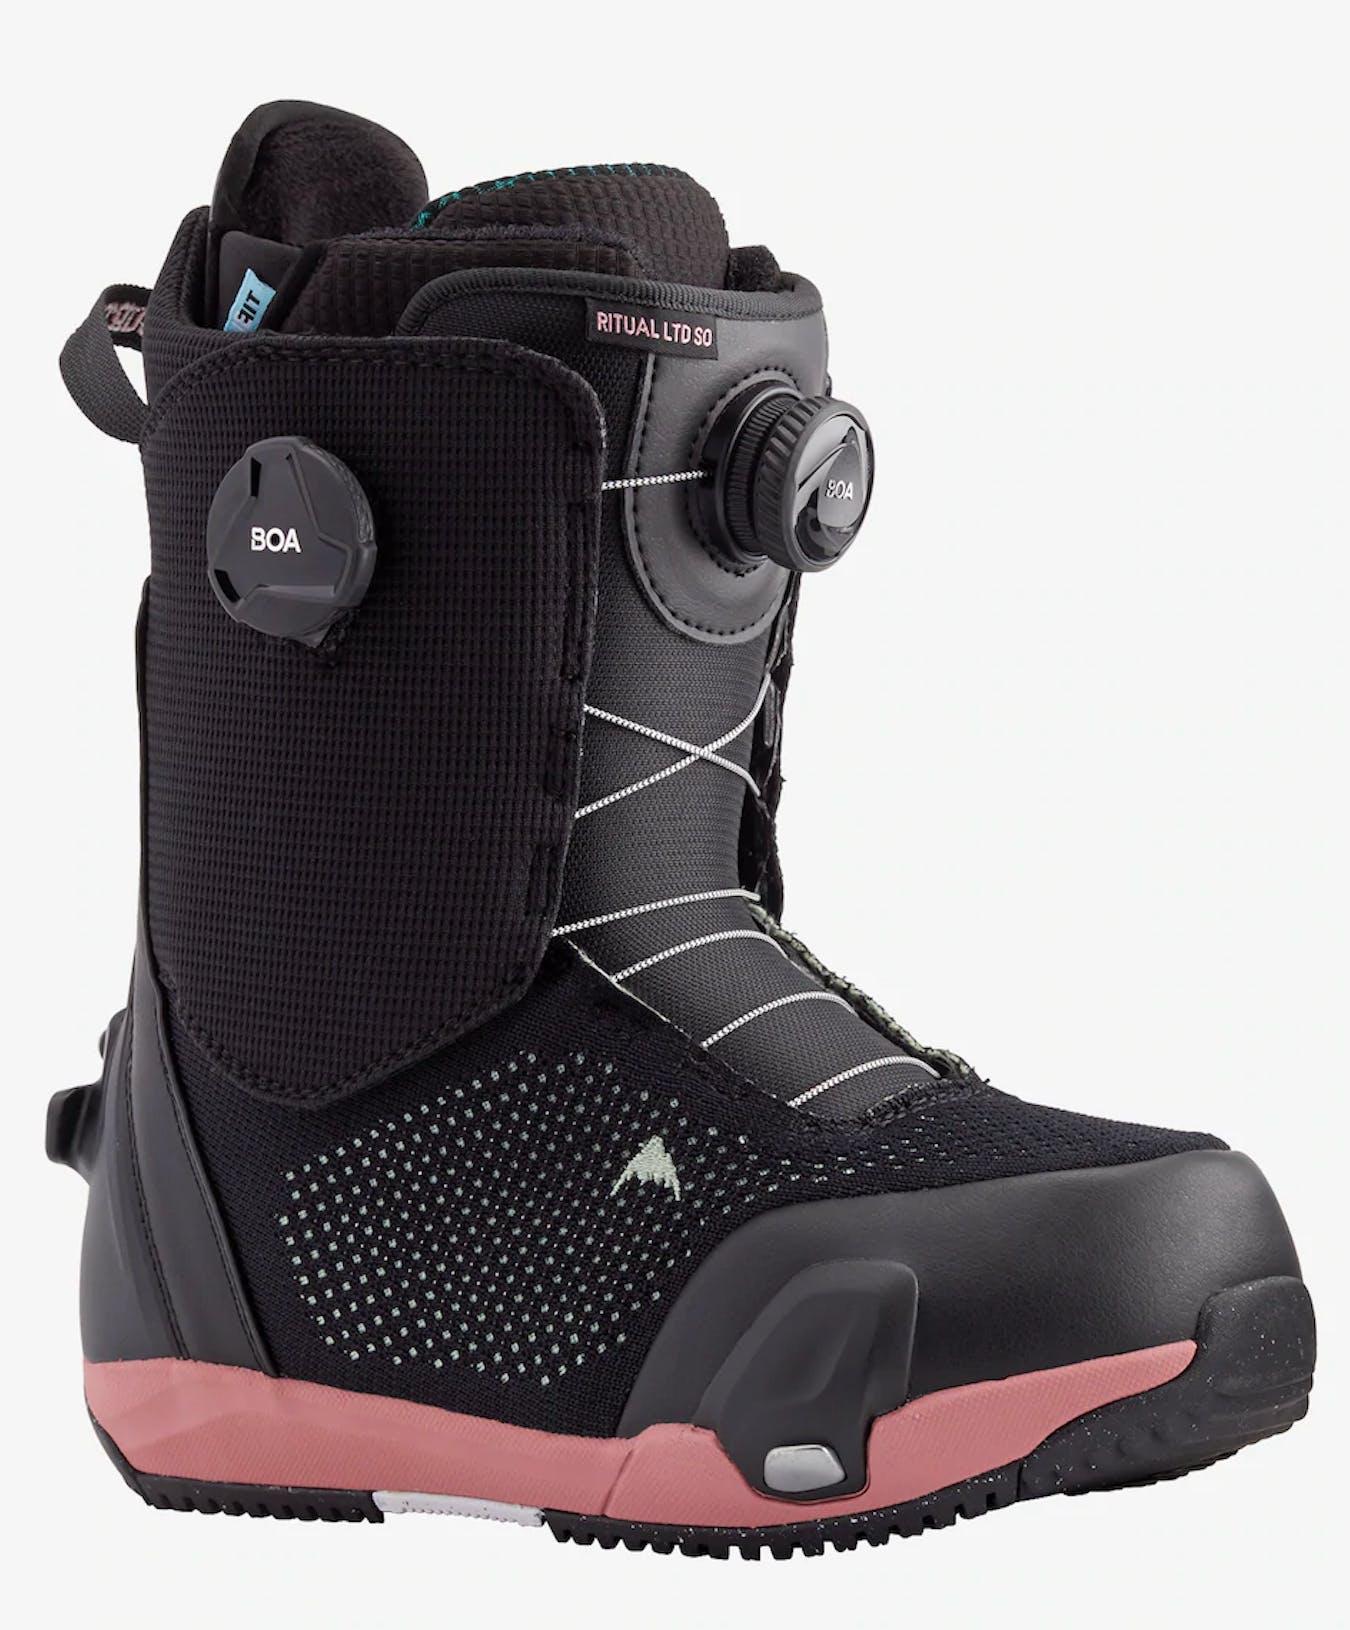 Burton Ritual LTD Step On Snowboard Boots · 2021